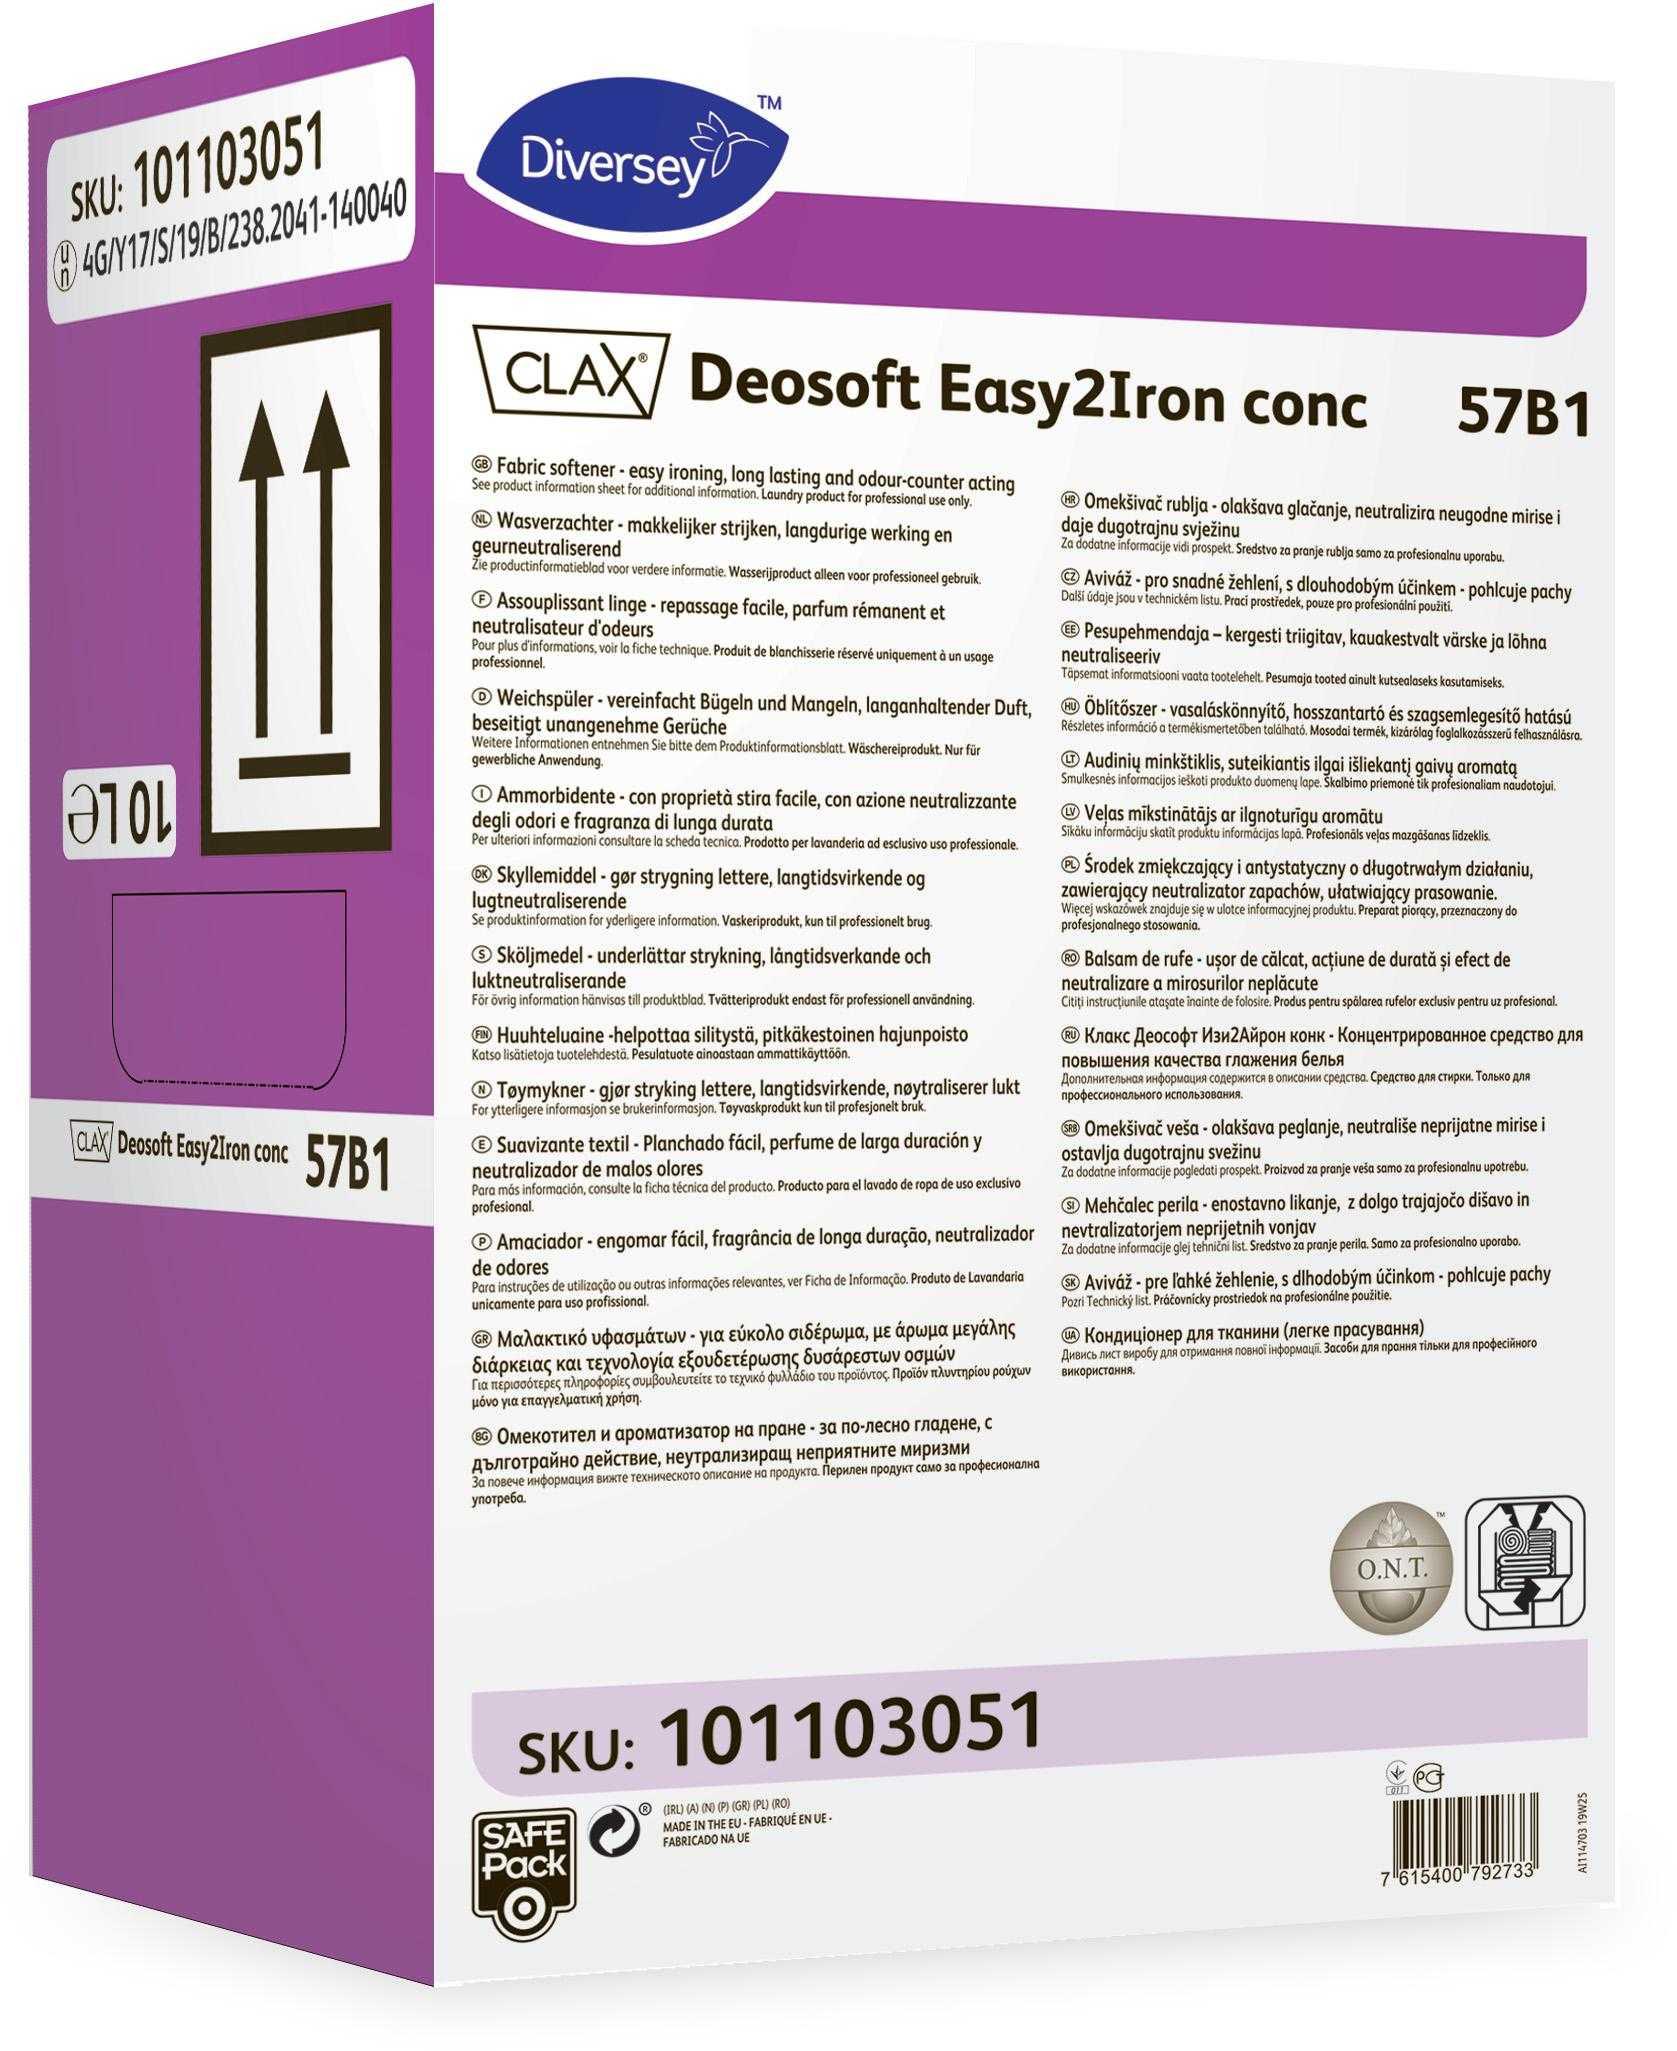 101103051-Clax-Deosoft-Easy2Iron-10L-SafePack-20x20cm.jpg